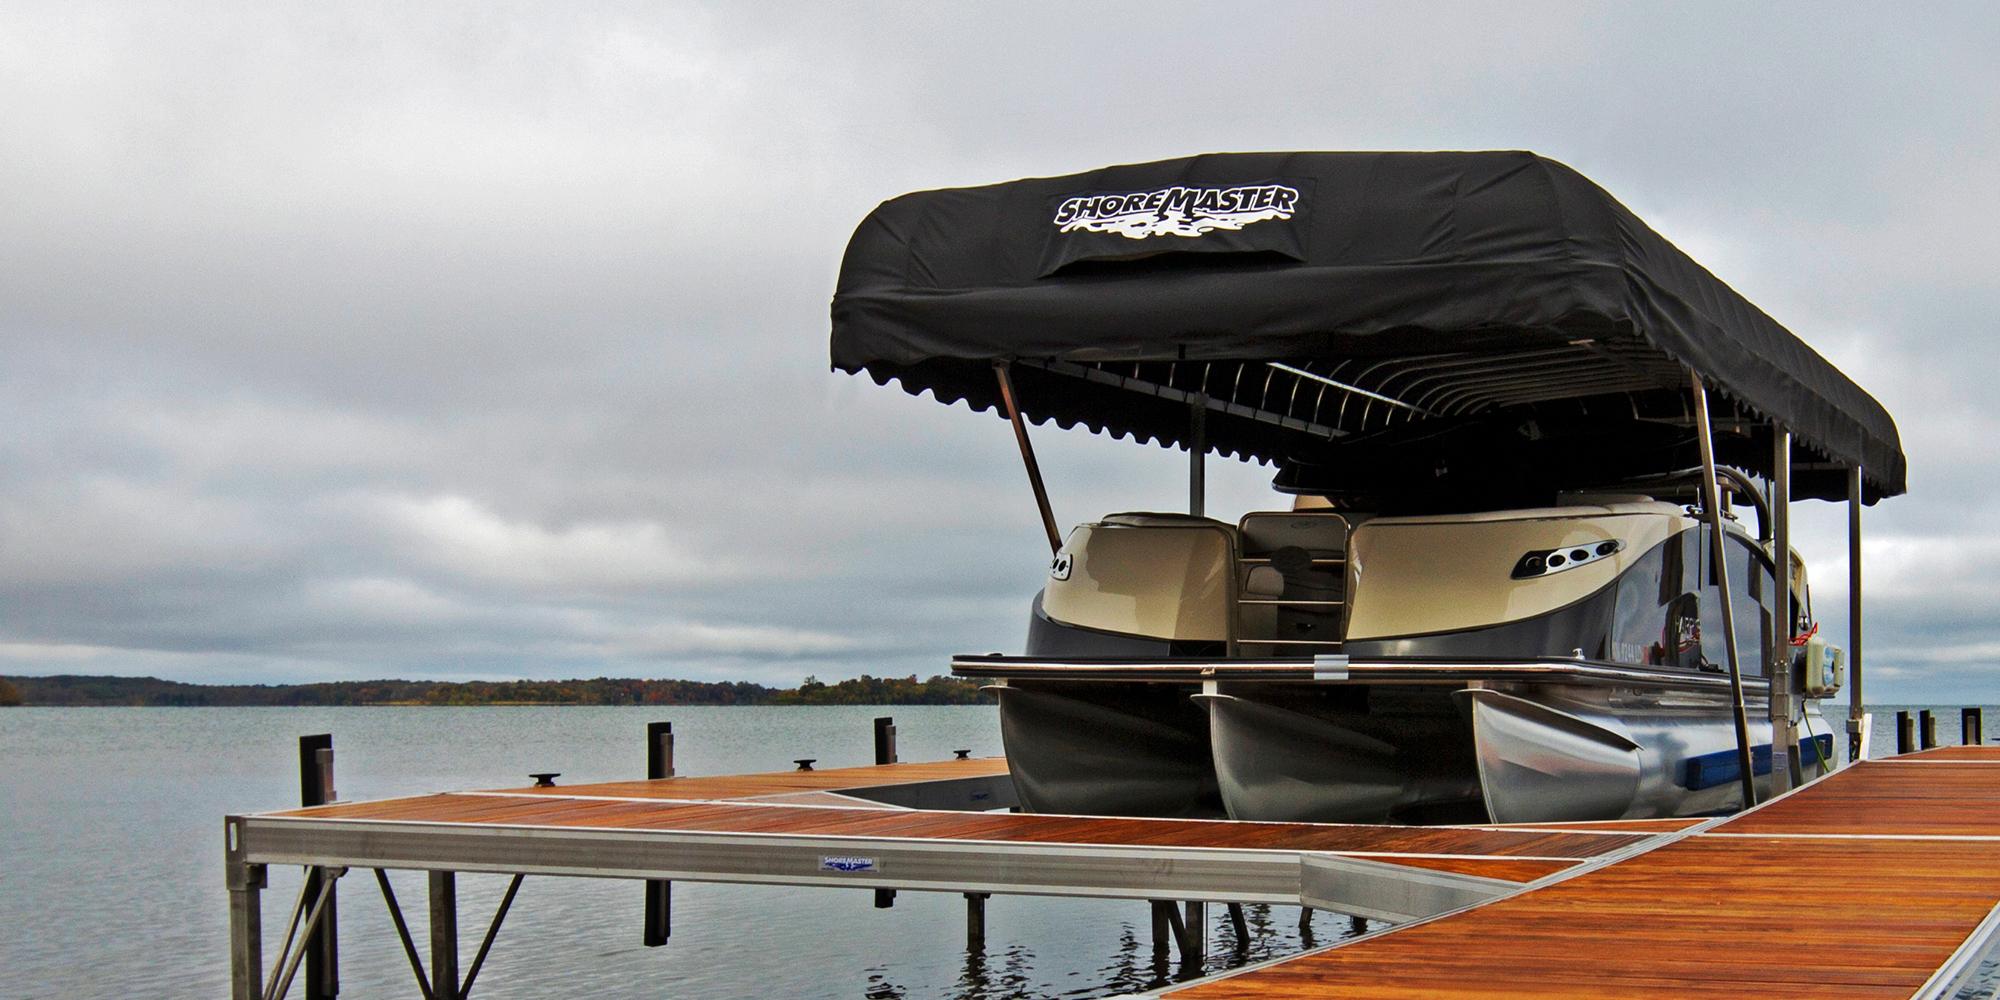 ShoreMaster Canopy Systems